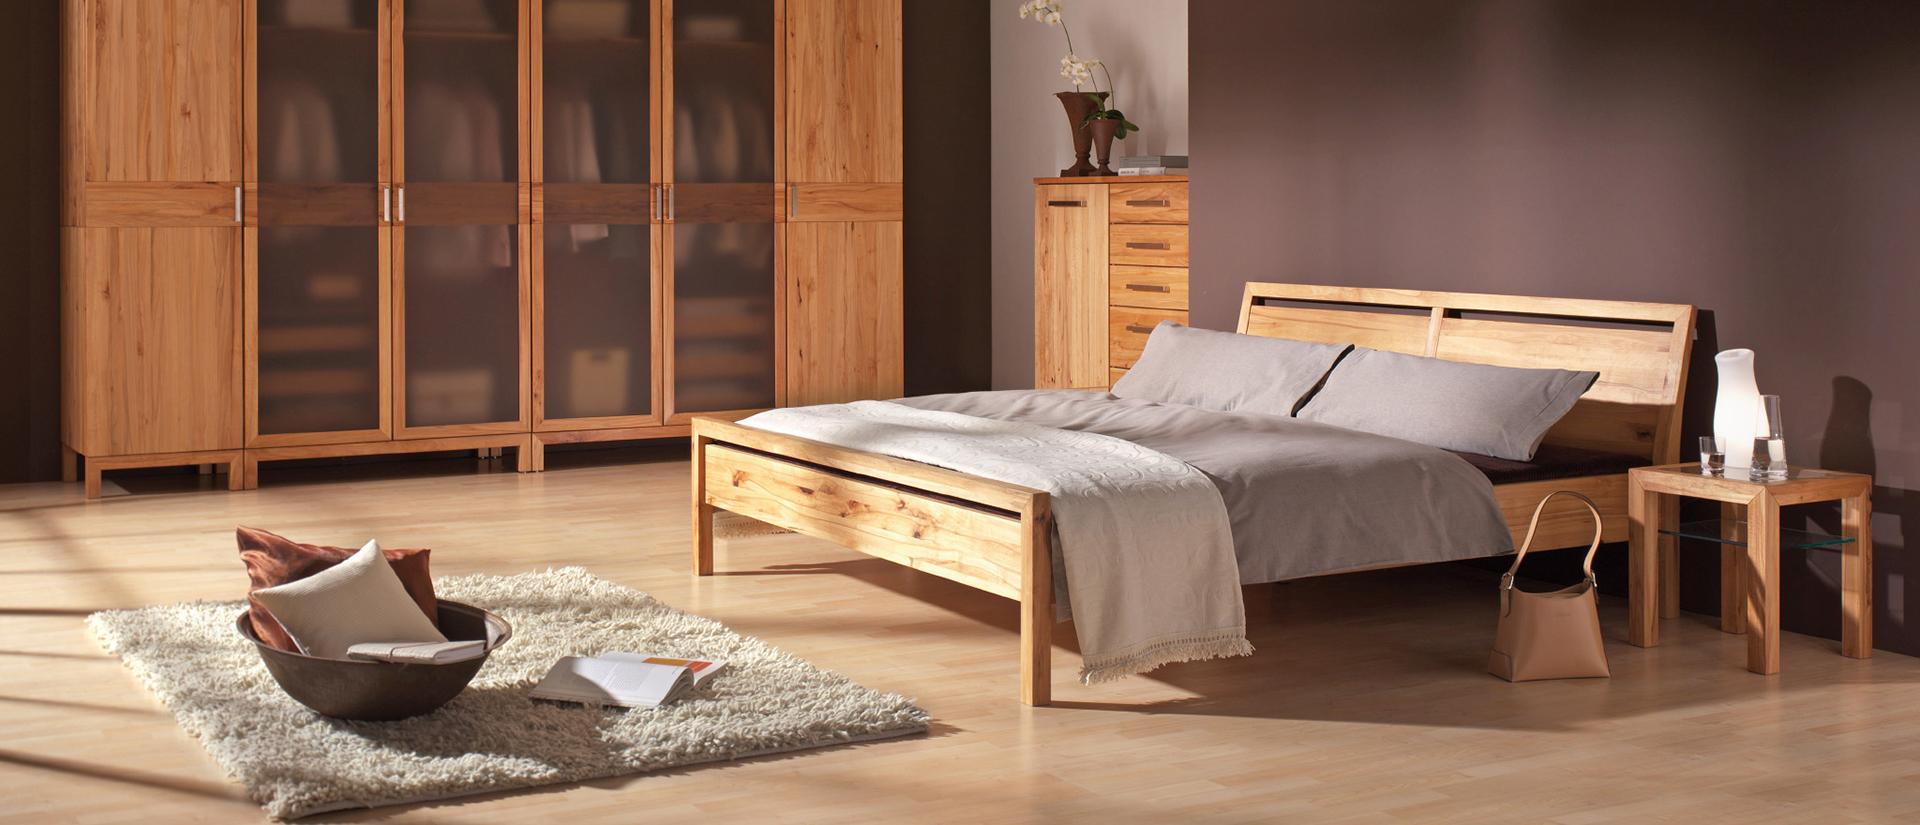 Massivholz - Betten - Köln und Bonn